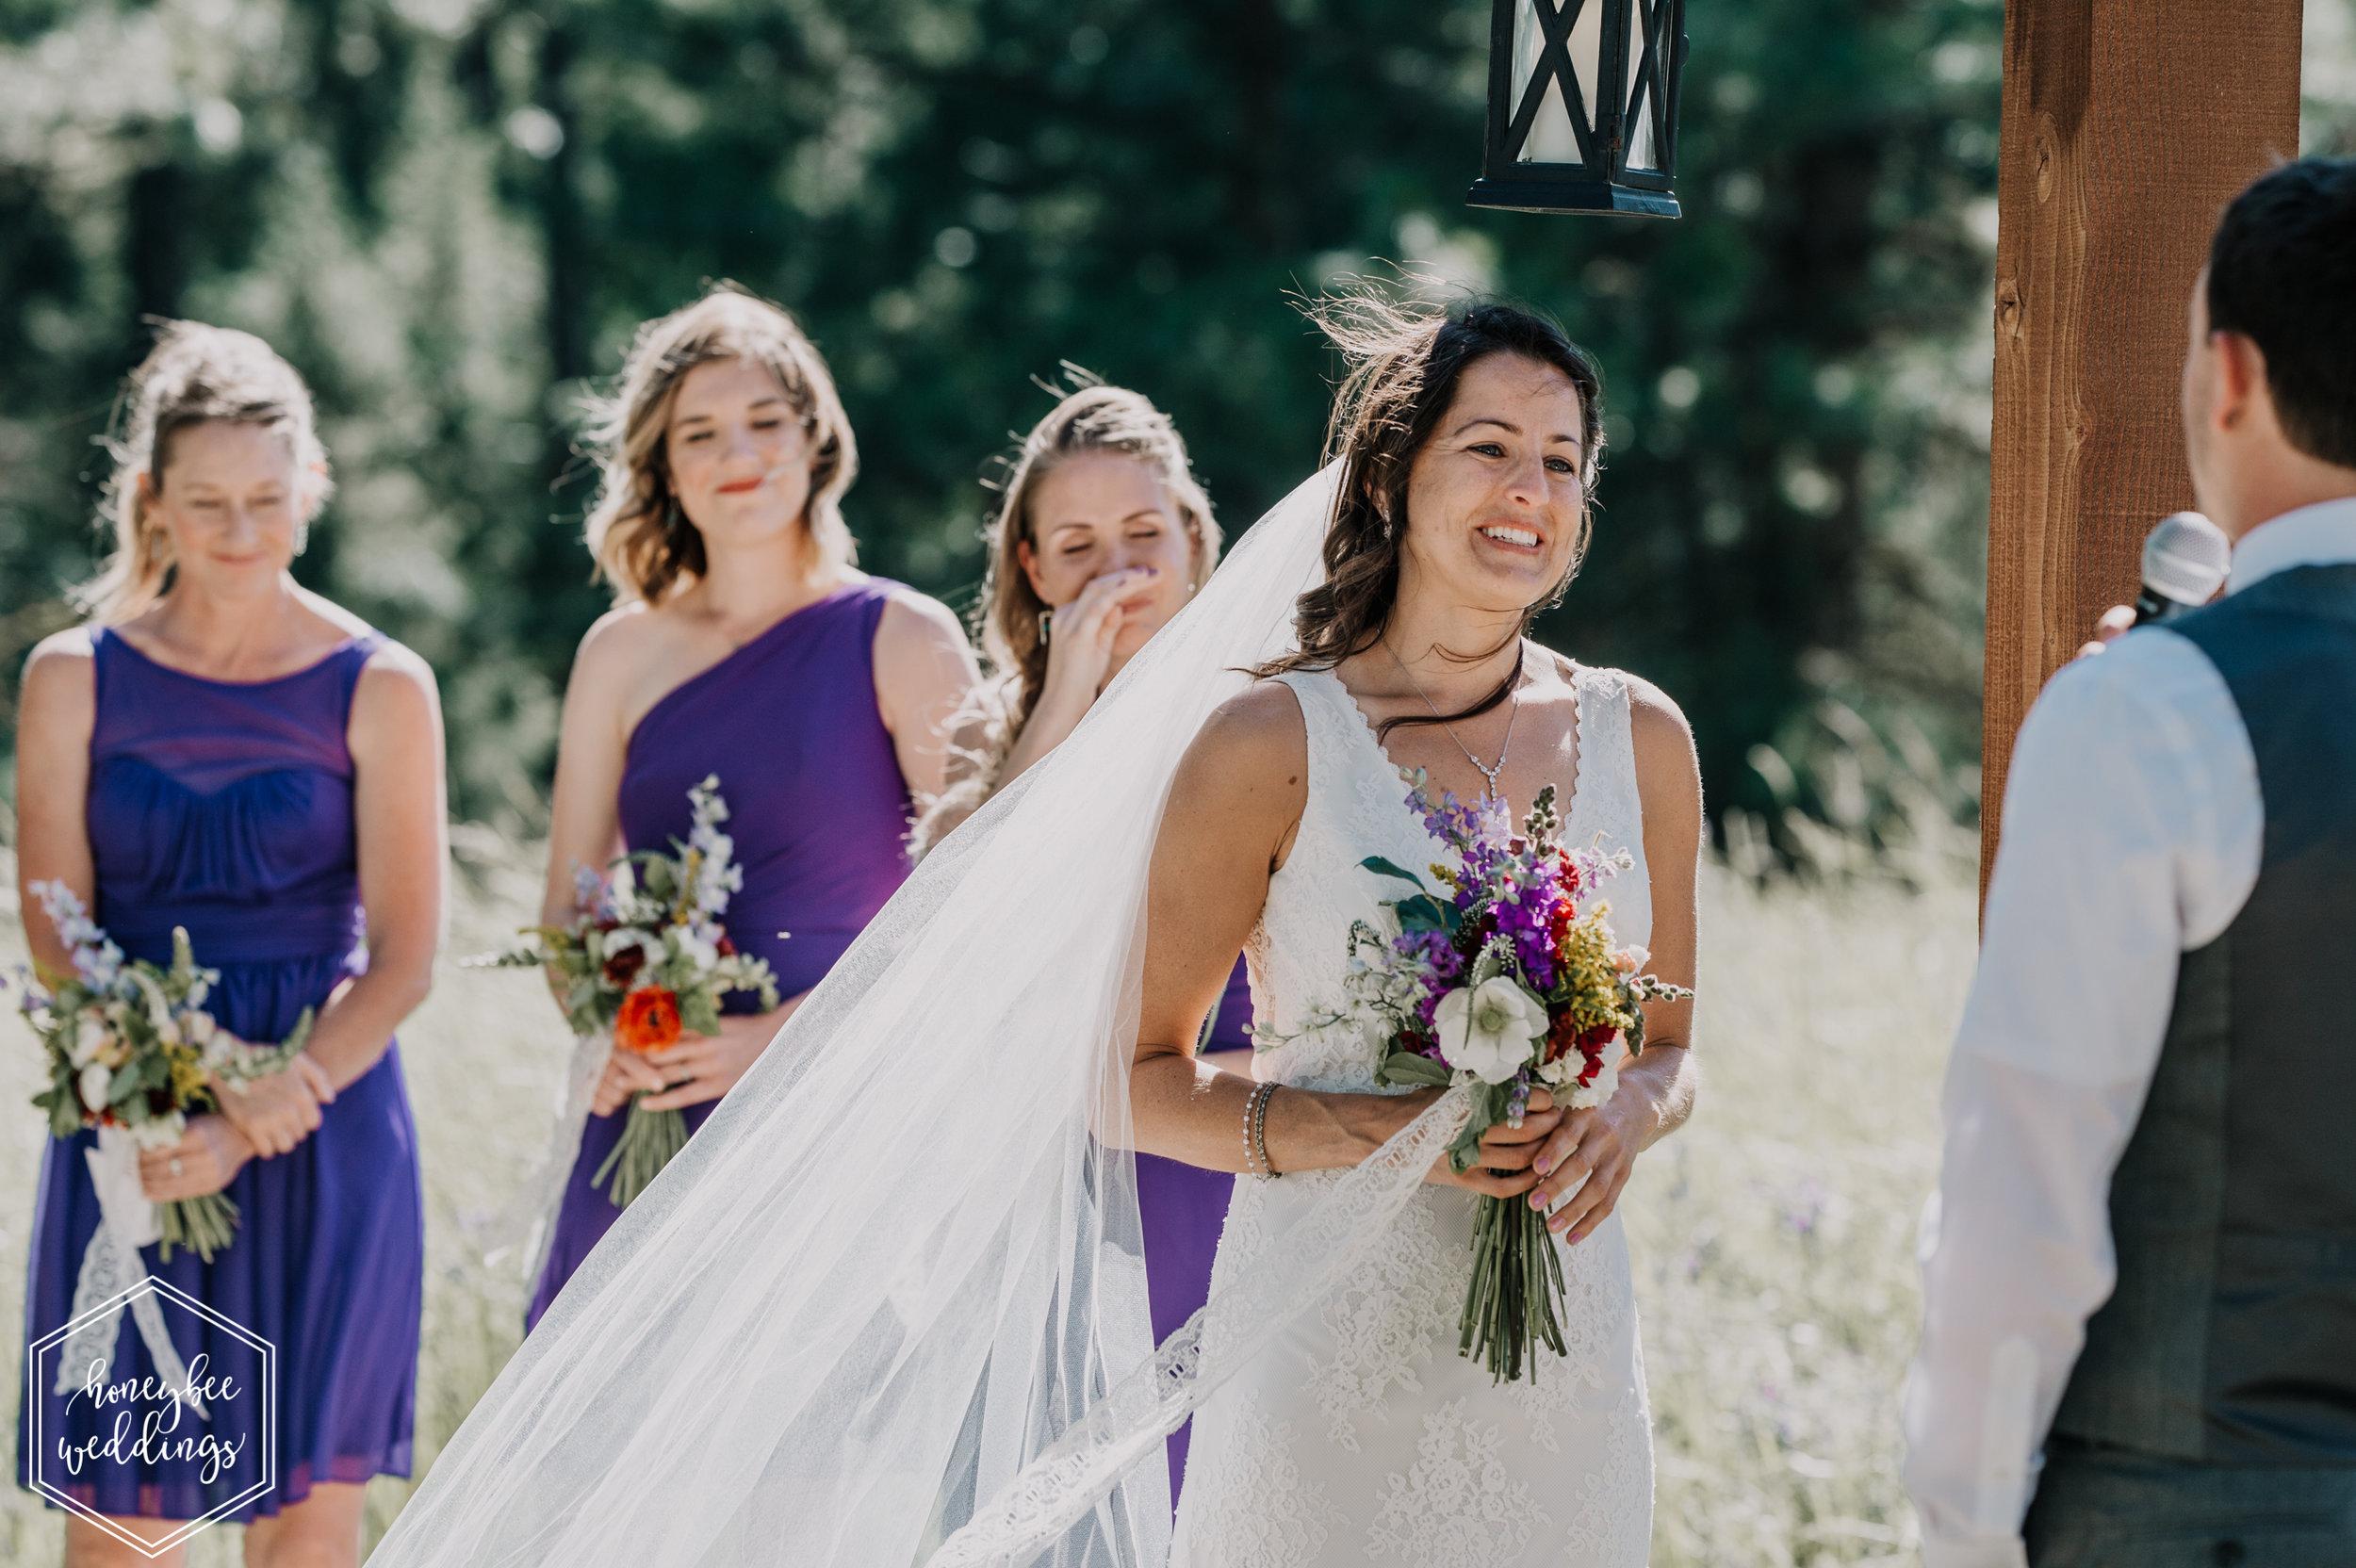 303 White Raven Wedding_Montana Wedding Photographer_Honeybee Weddings_ Meghan Maloney + Arza Hammond 2018-8764.jpg